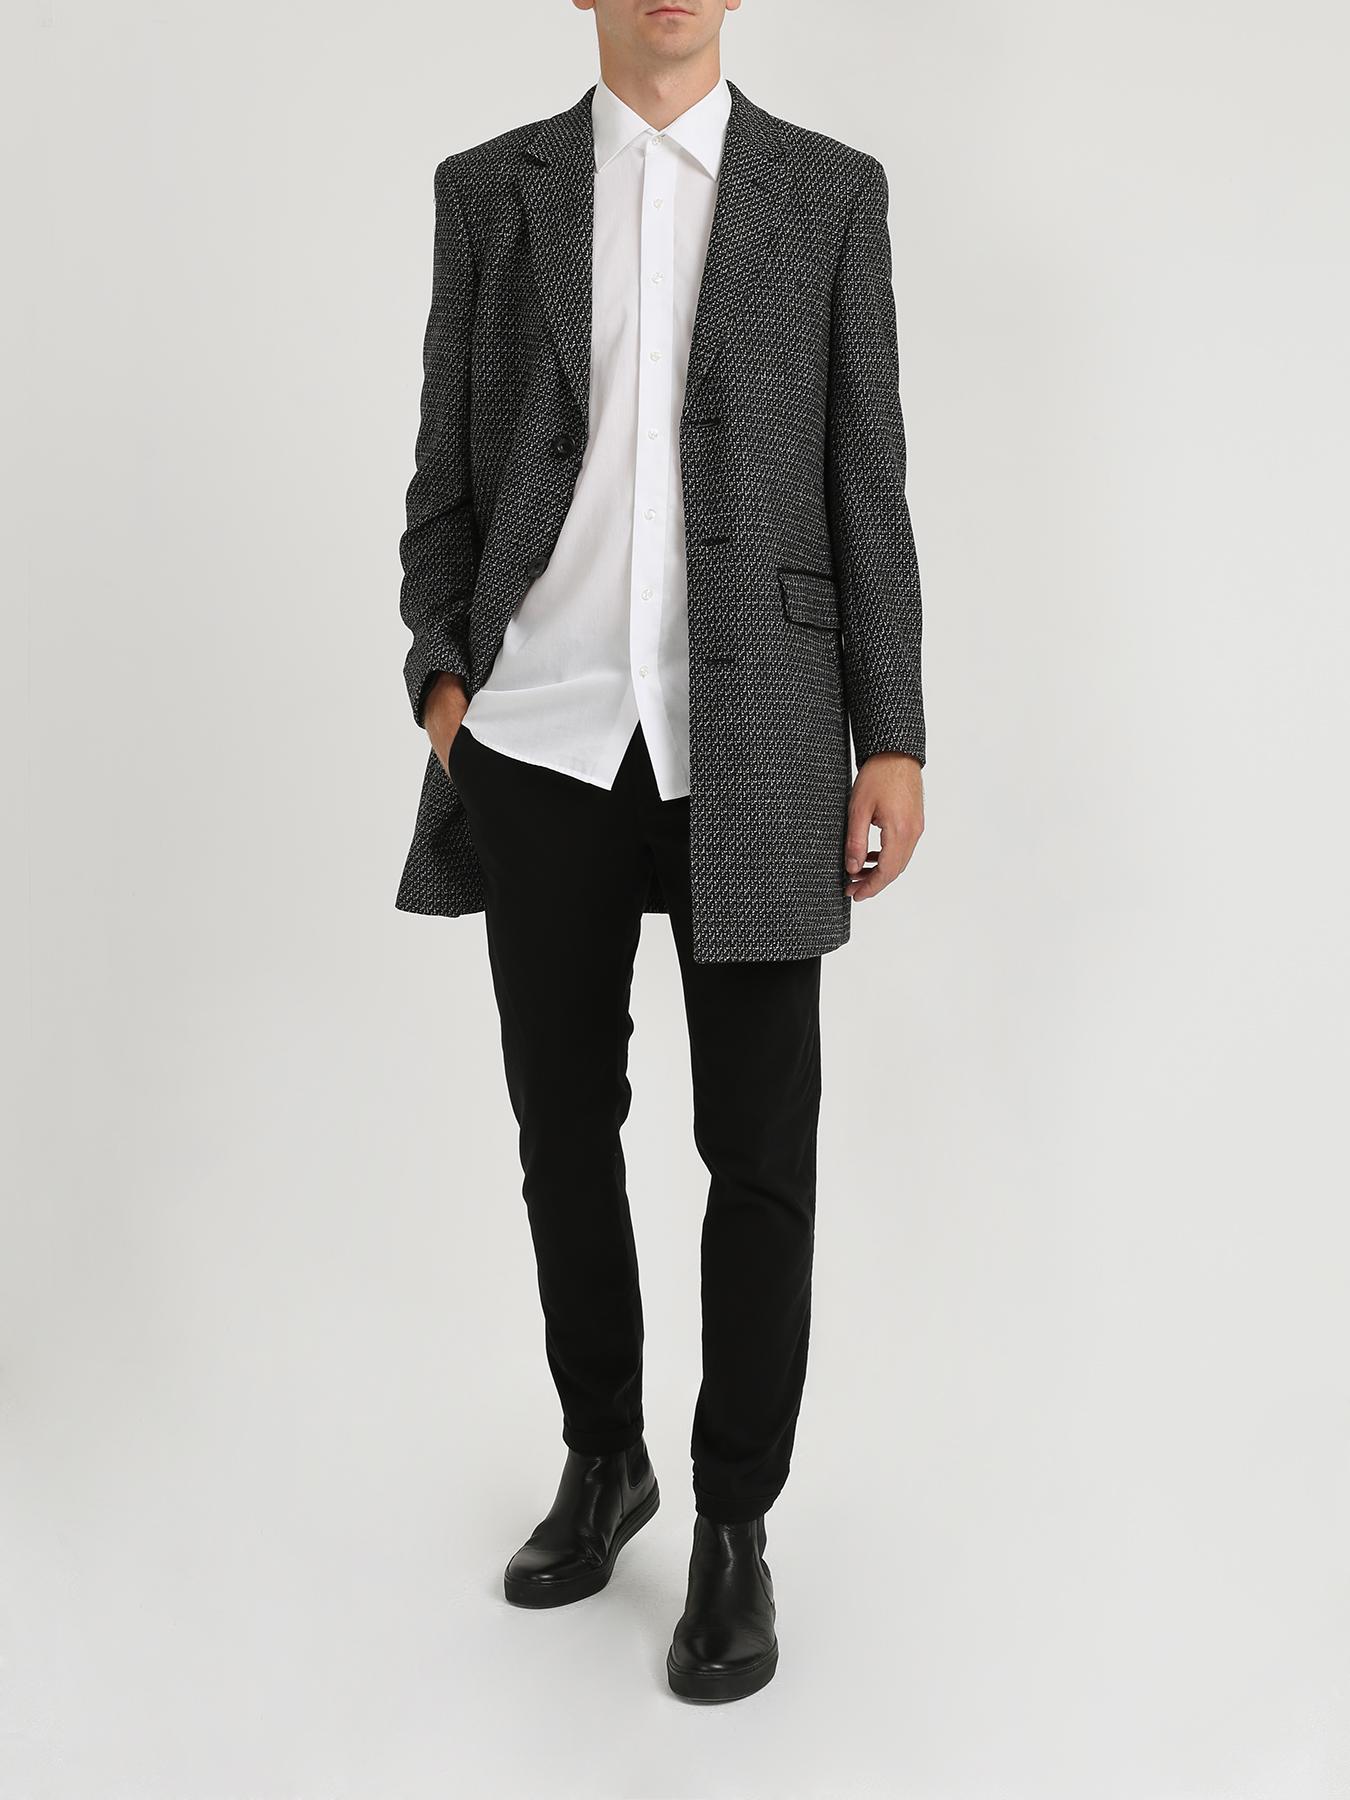 Пальто Alessandro Manzoni Мужское пальто